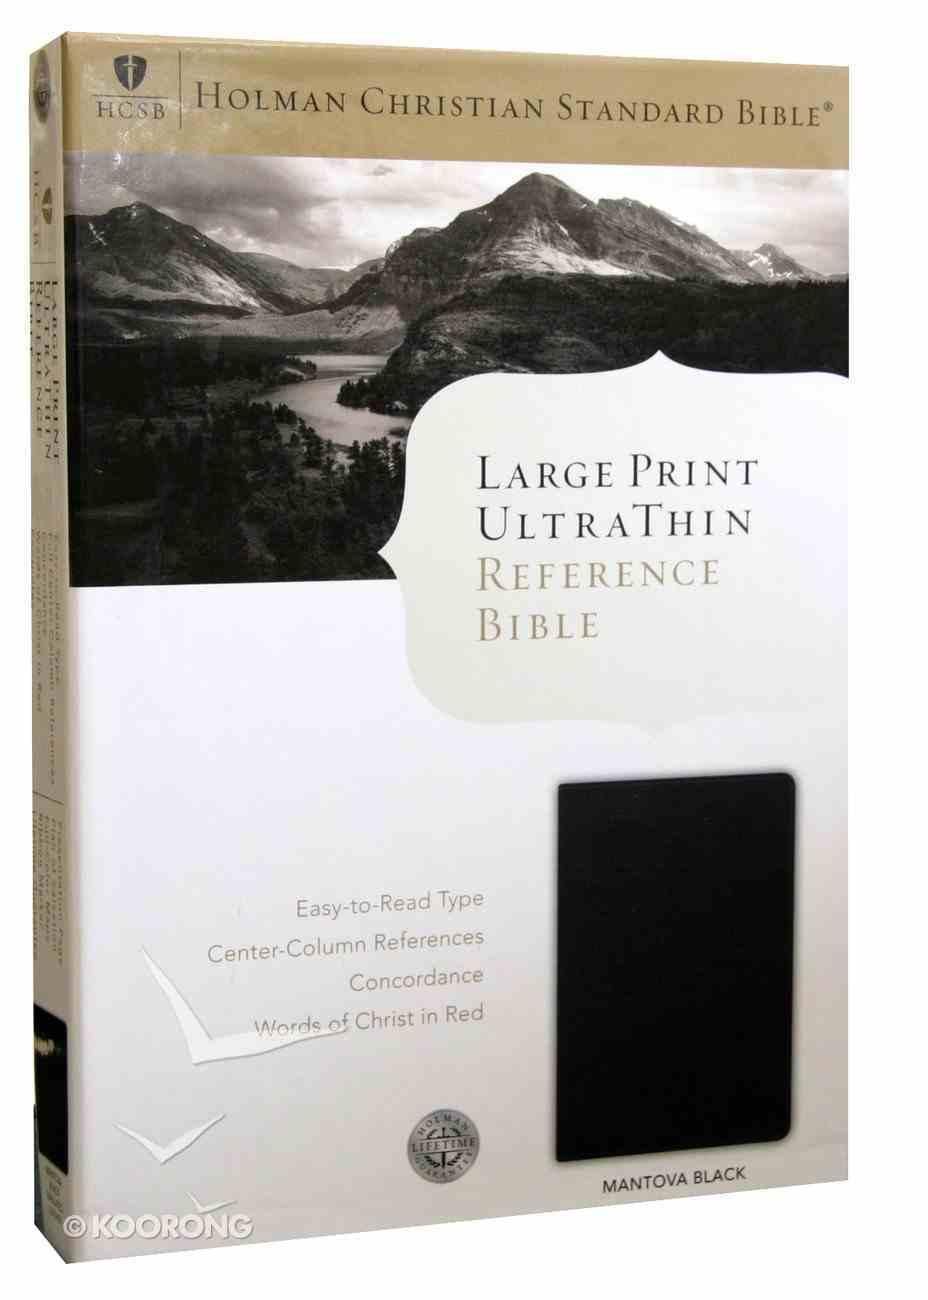 HCSB Large Print Ultrathin Bible Mantova Black Simulated Leather Imitation Leather